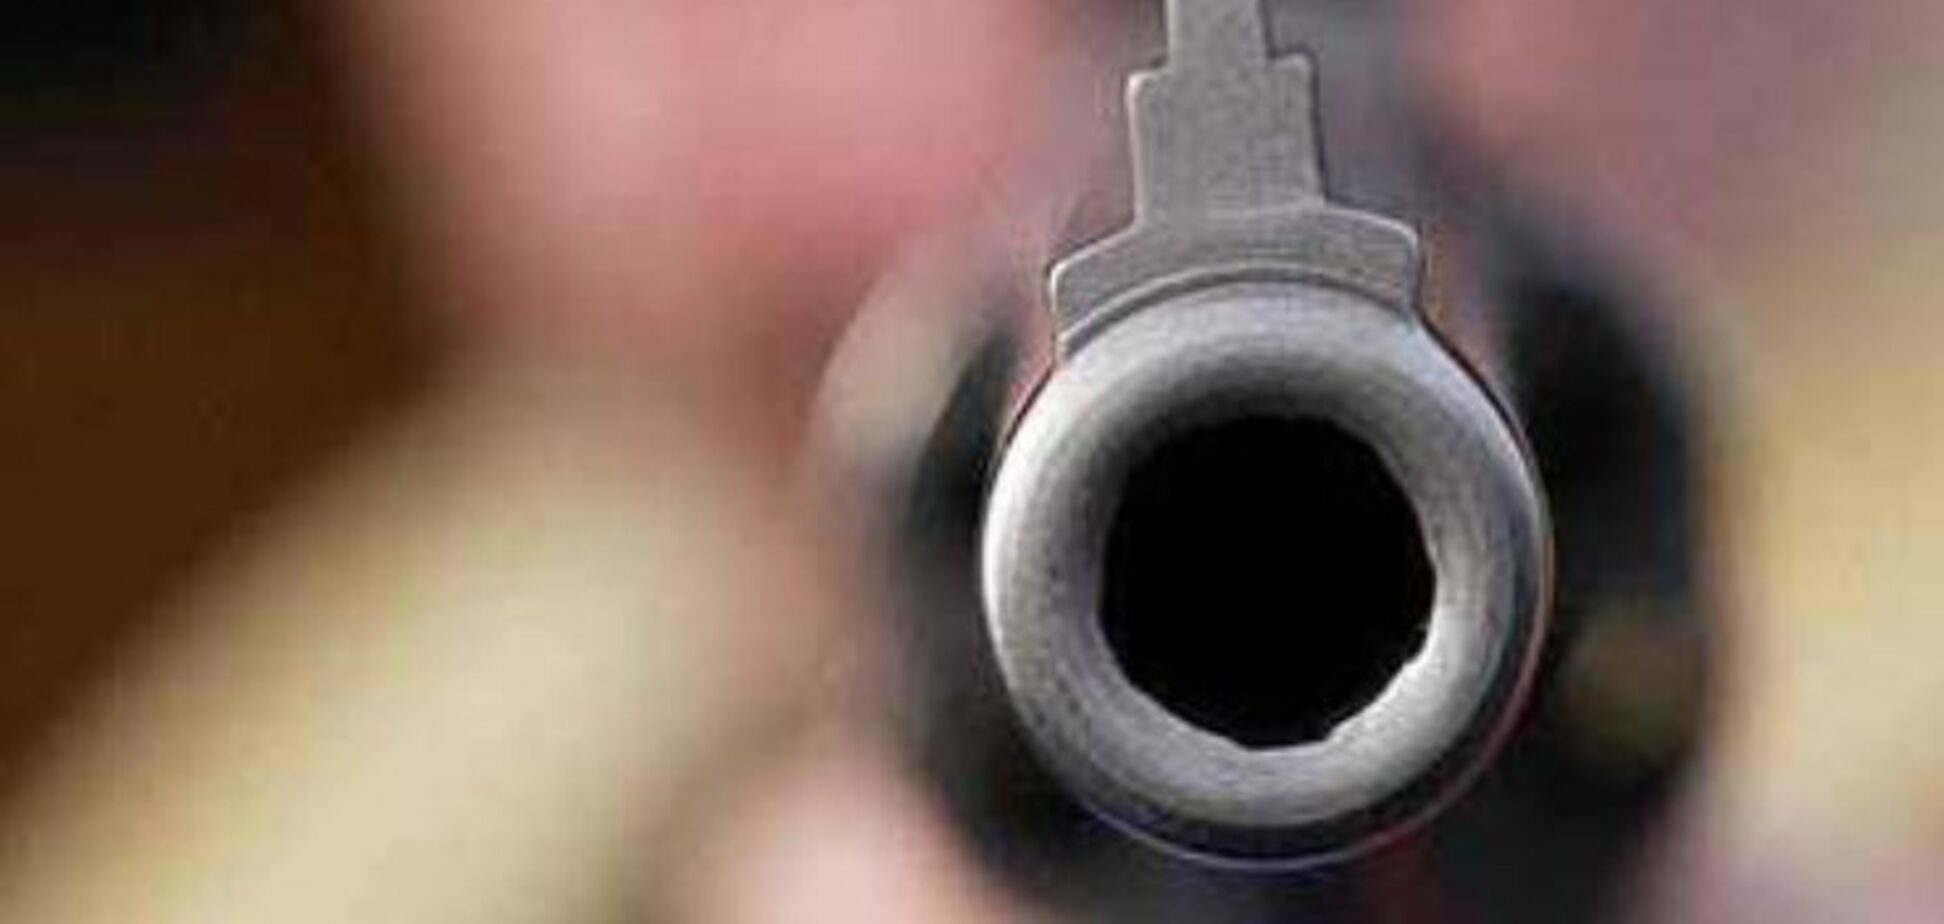 На Житомирщине из винтовки ранили 10-летнюю девочку: детали инцидента